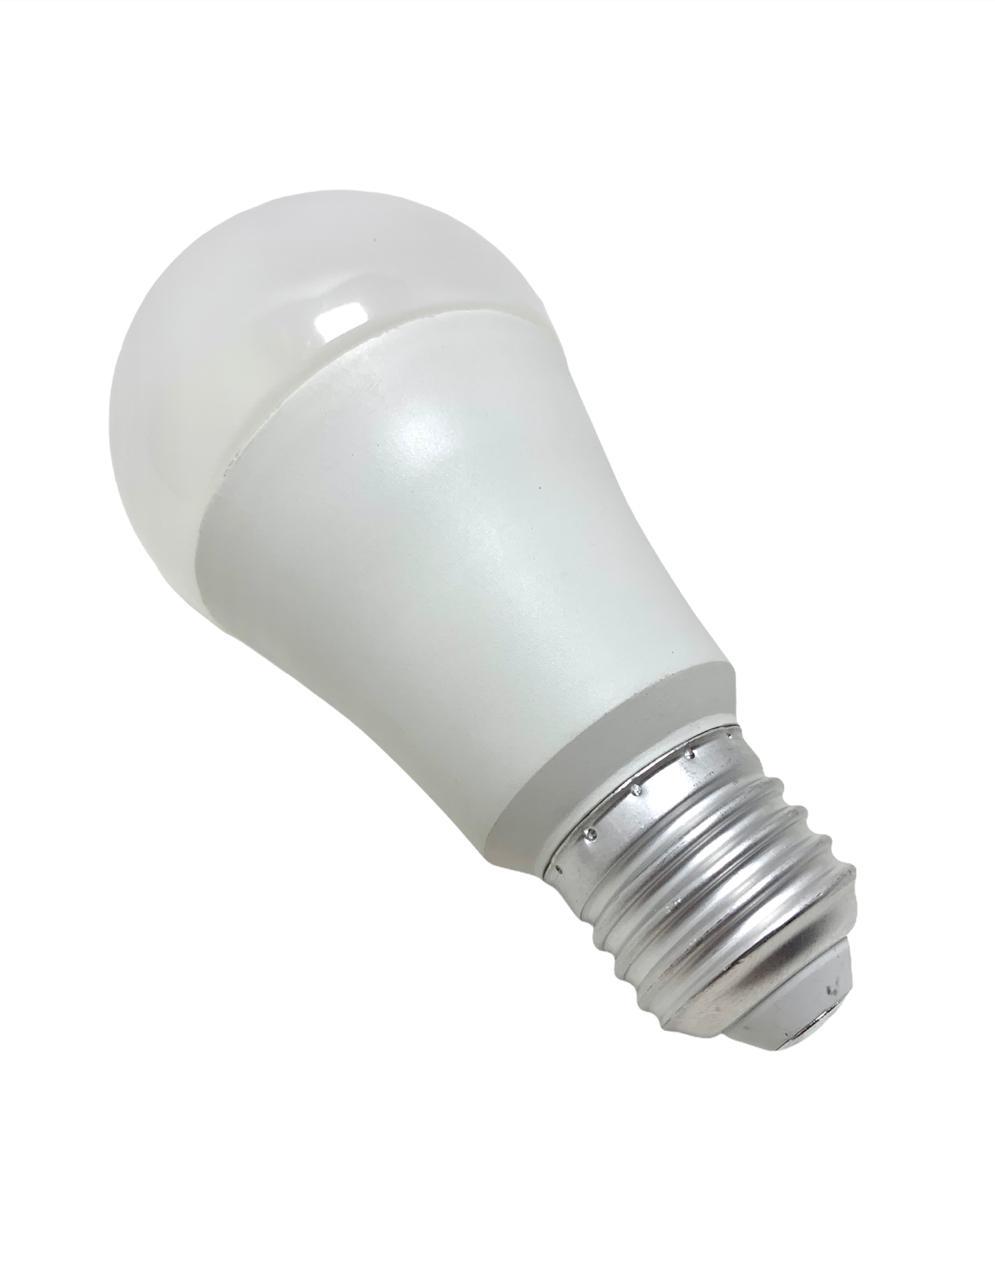 Lâmpada Bulbo de Led 16 W Branco Frio 6500 K Bivolt 960 lm